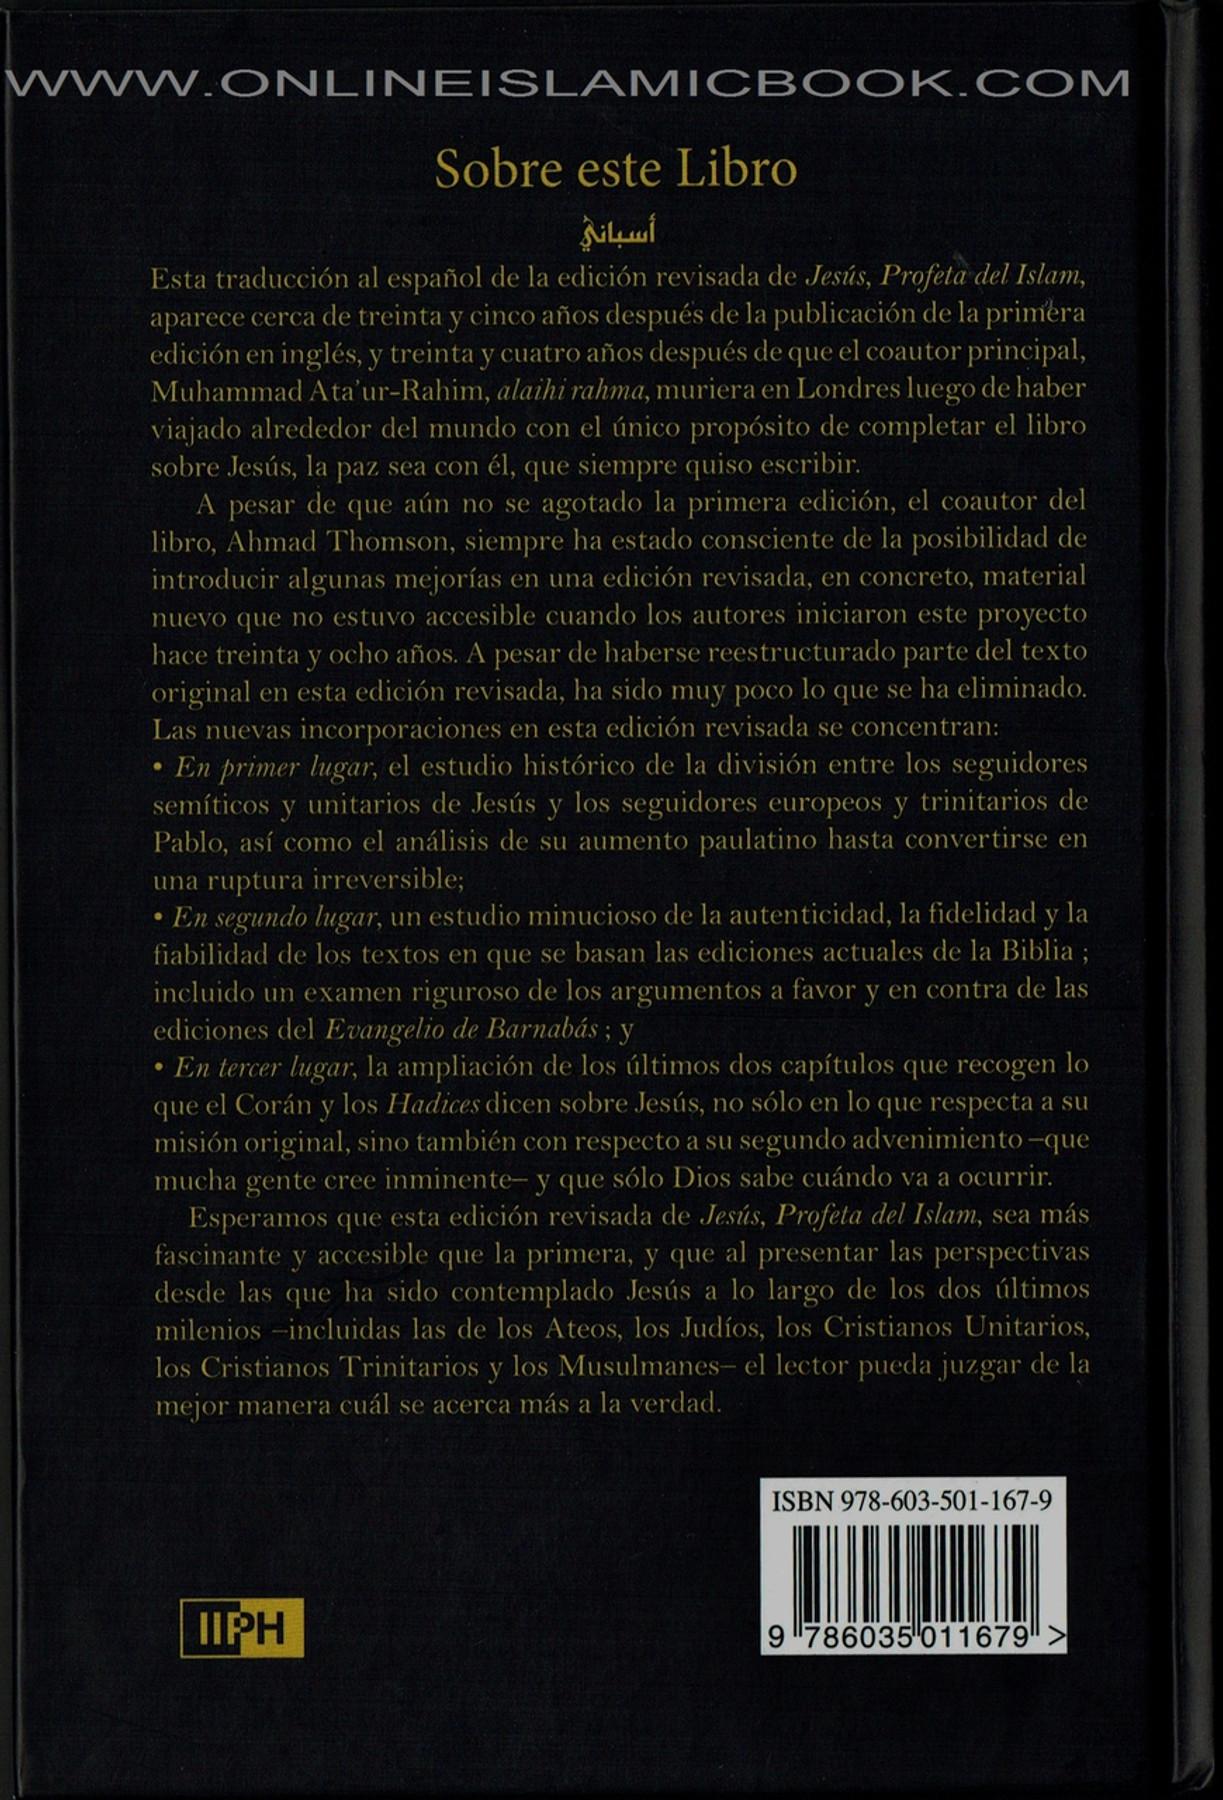 Spanish - Jesús, Profeta del Islam - Jesus Prophet of Islam